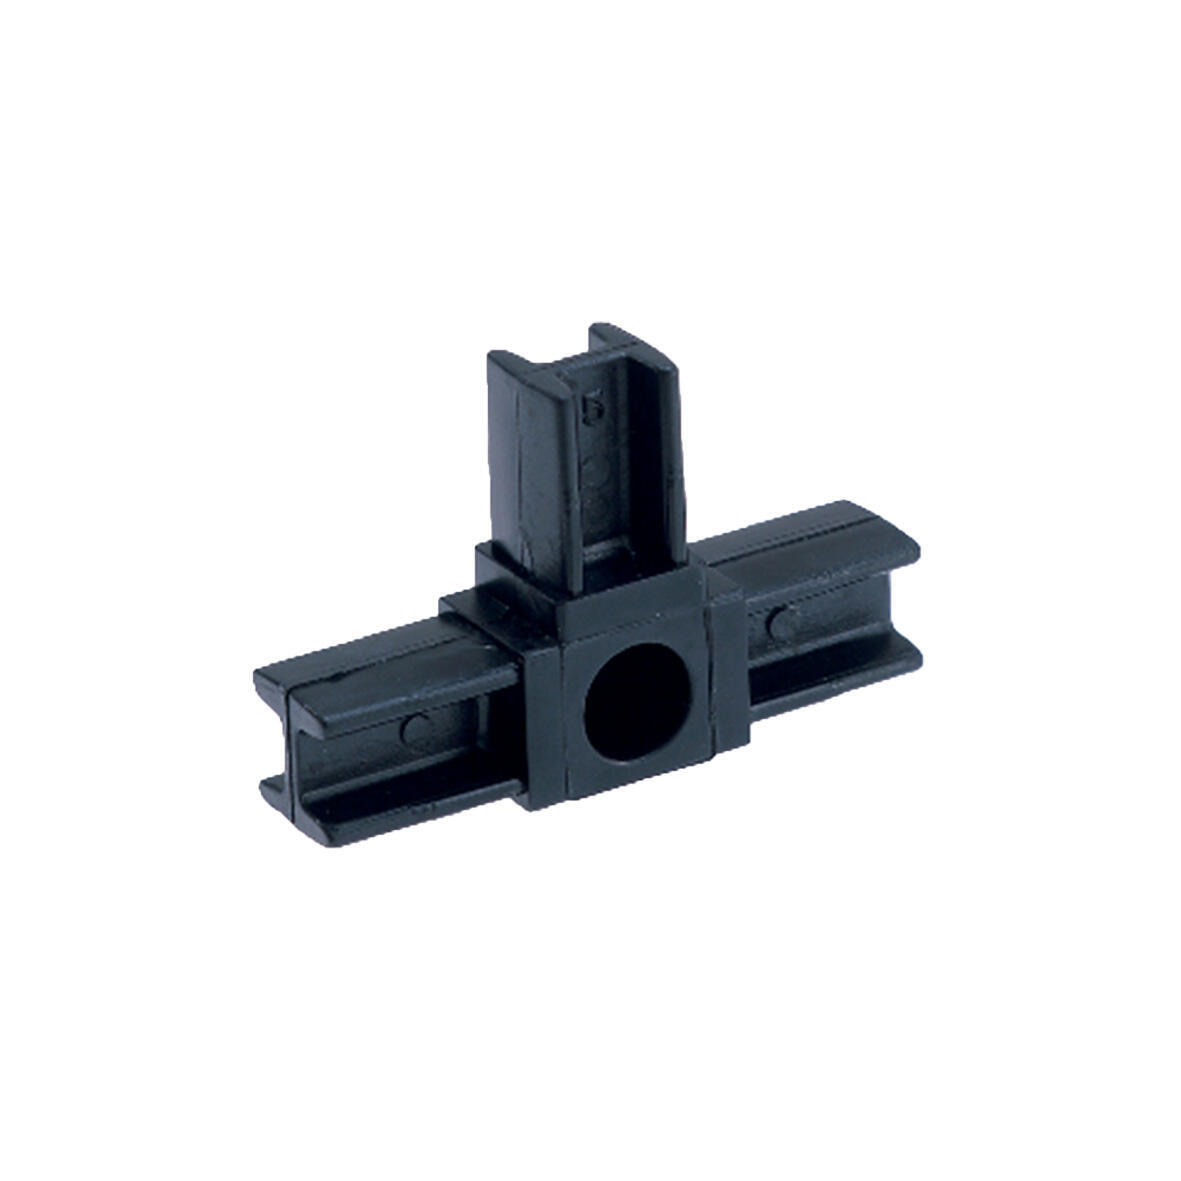 Raccordo T in pvc nero x 20 mm, - 2